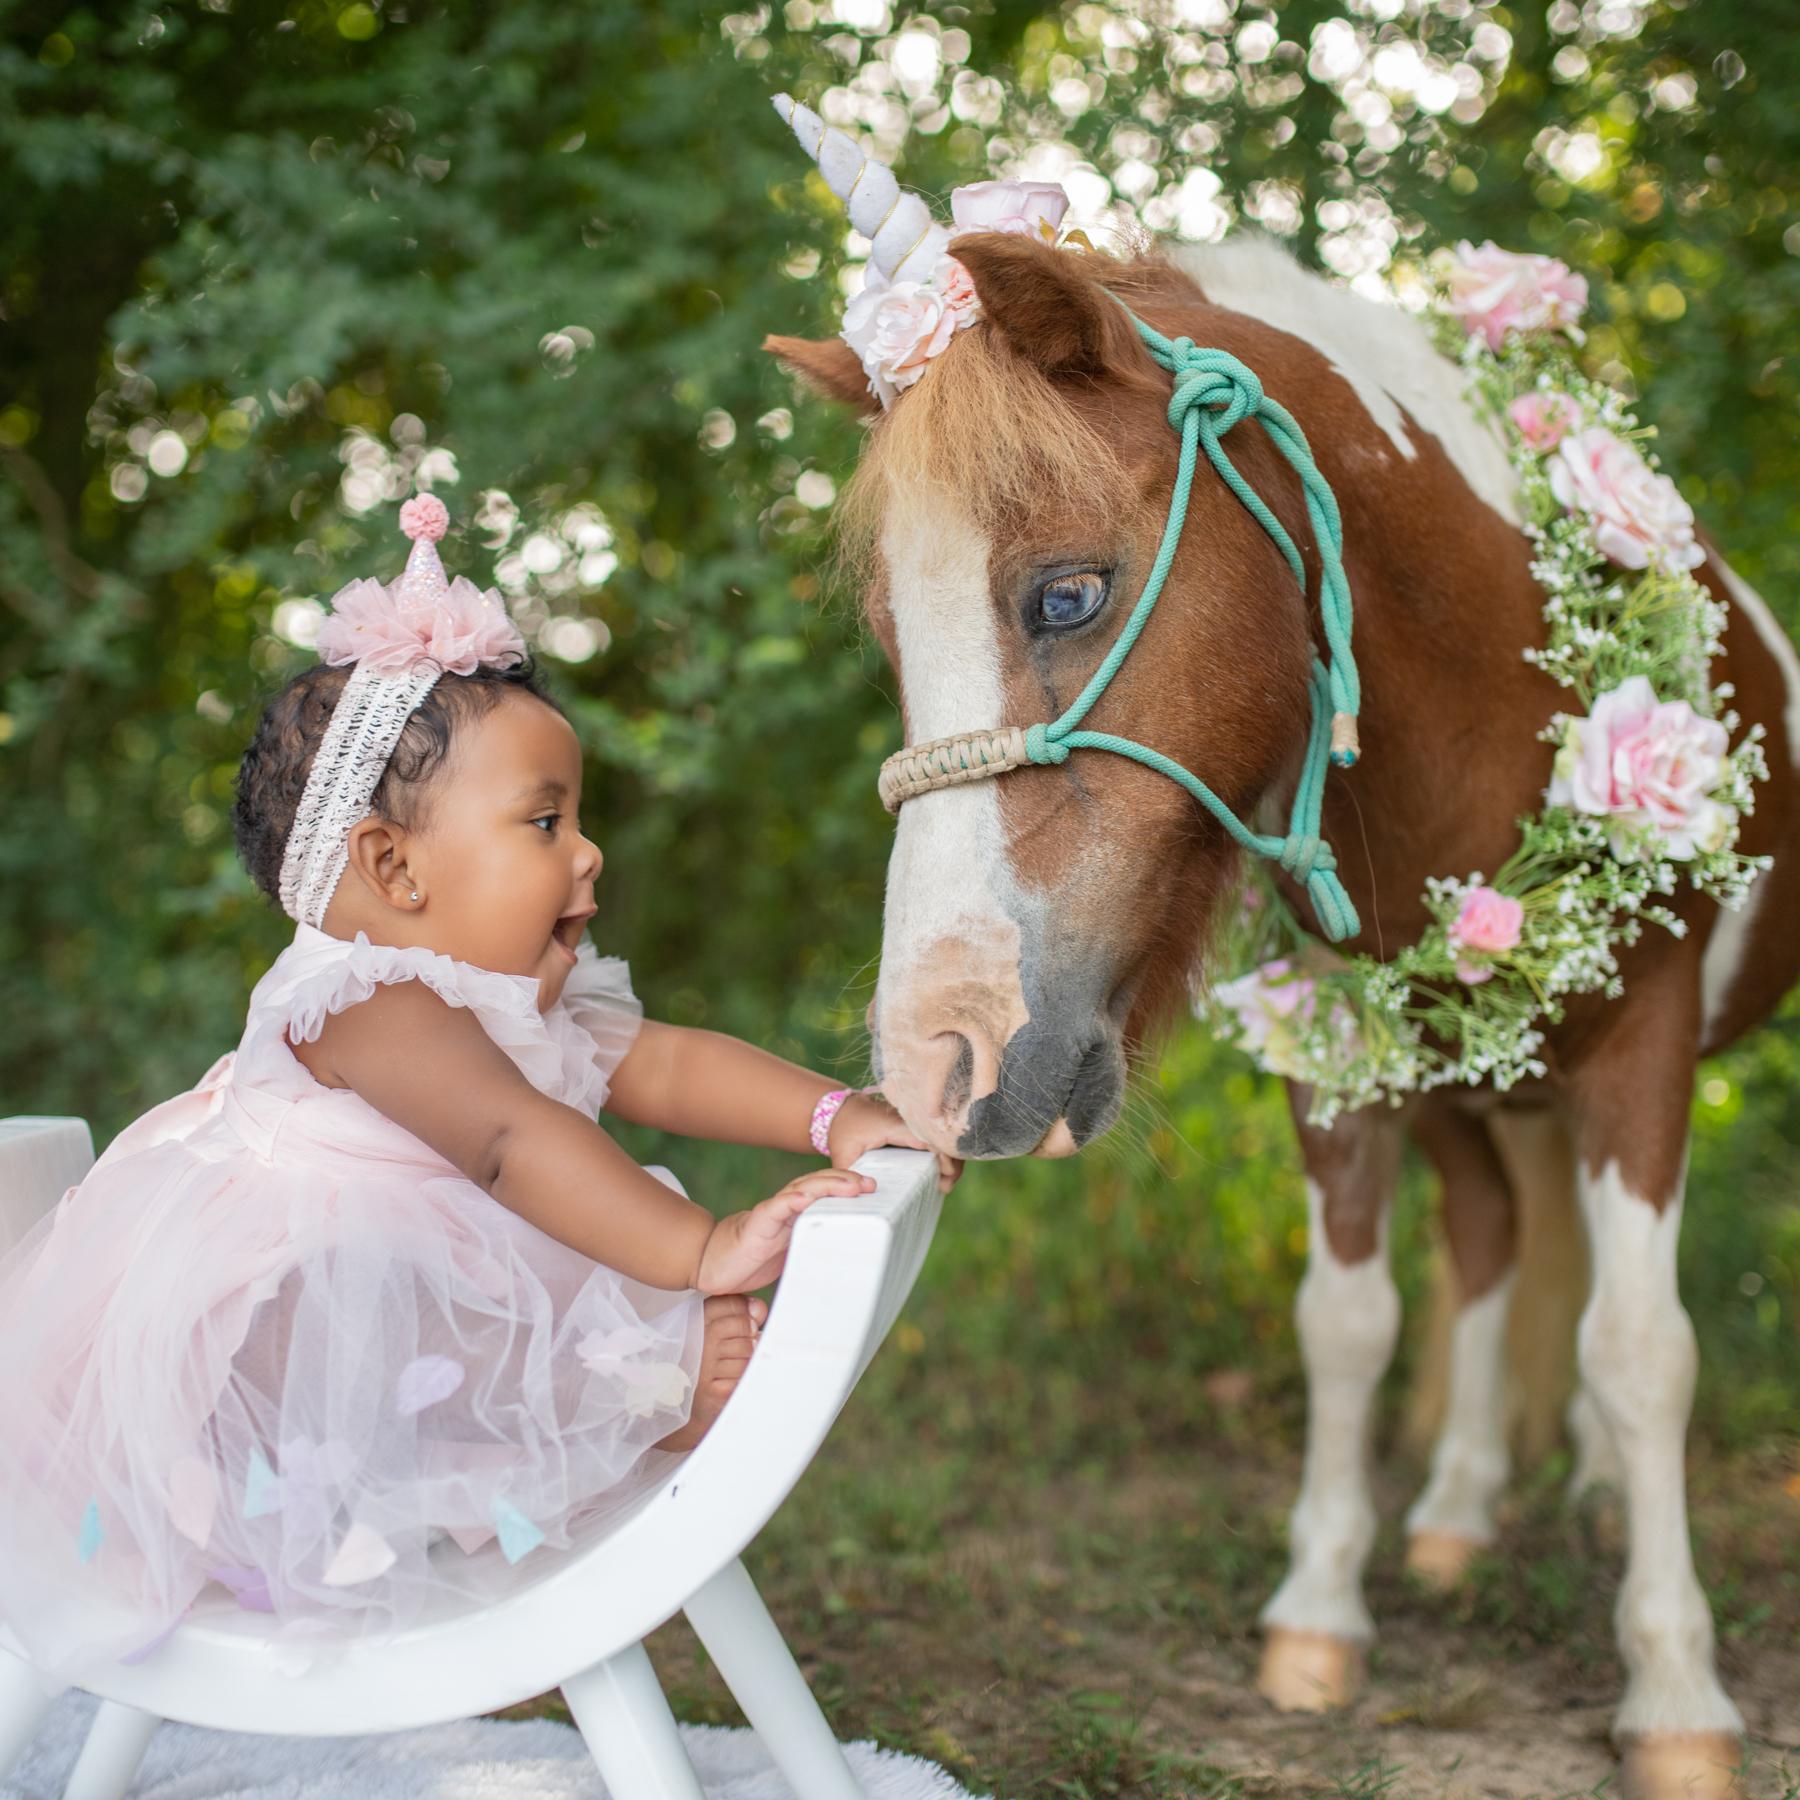 Chattanooga-Unicorn-Photos-3.jpg